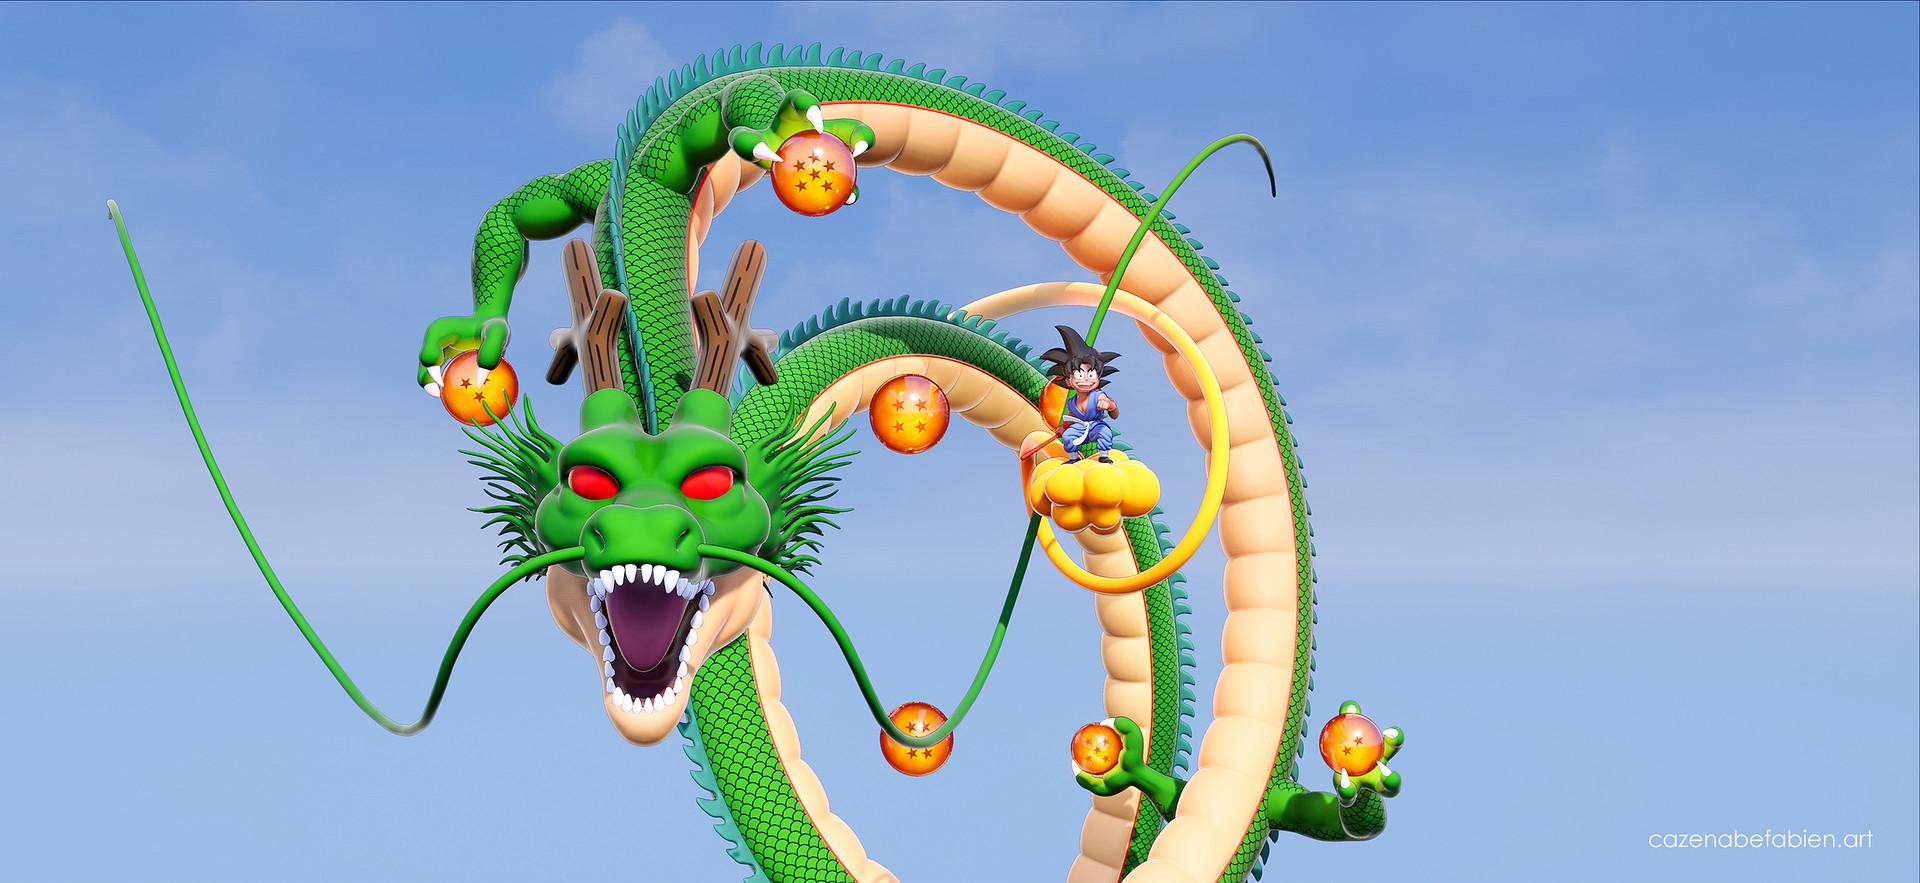 Fabien cazenabe sangoku dragon ball sculpt zbrush unreal 3d 01